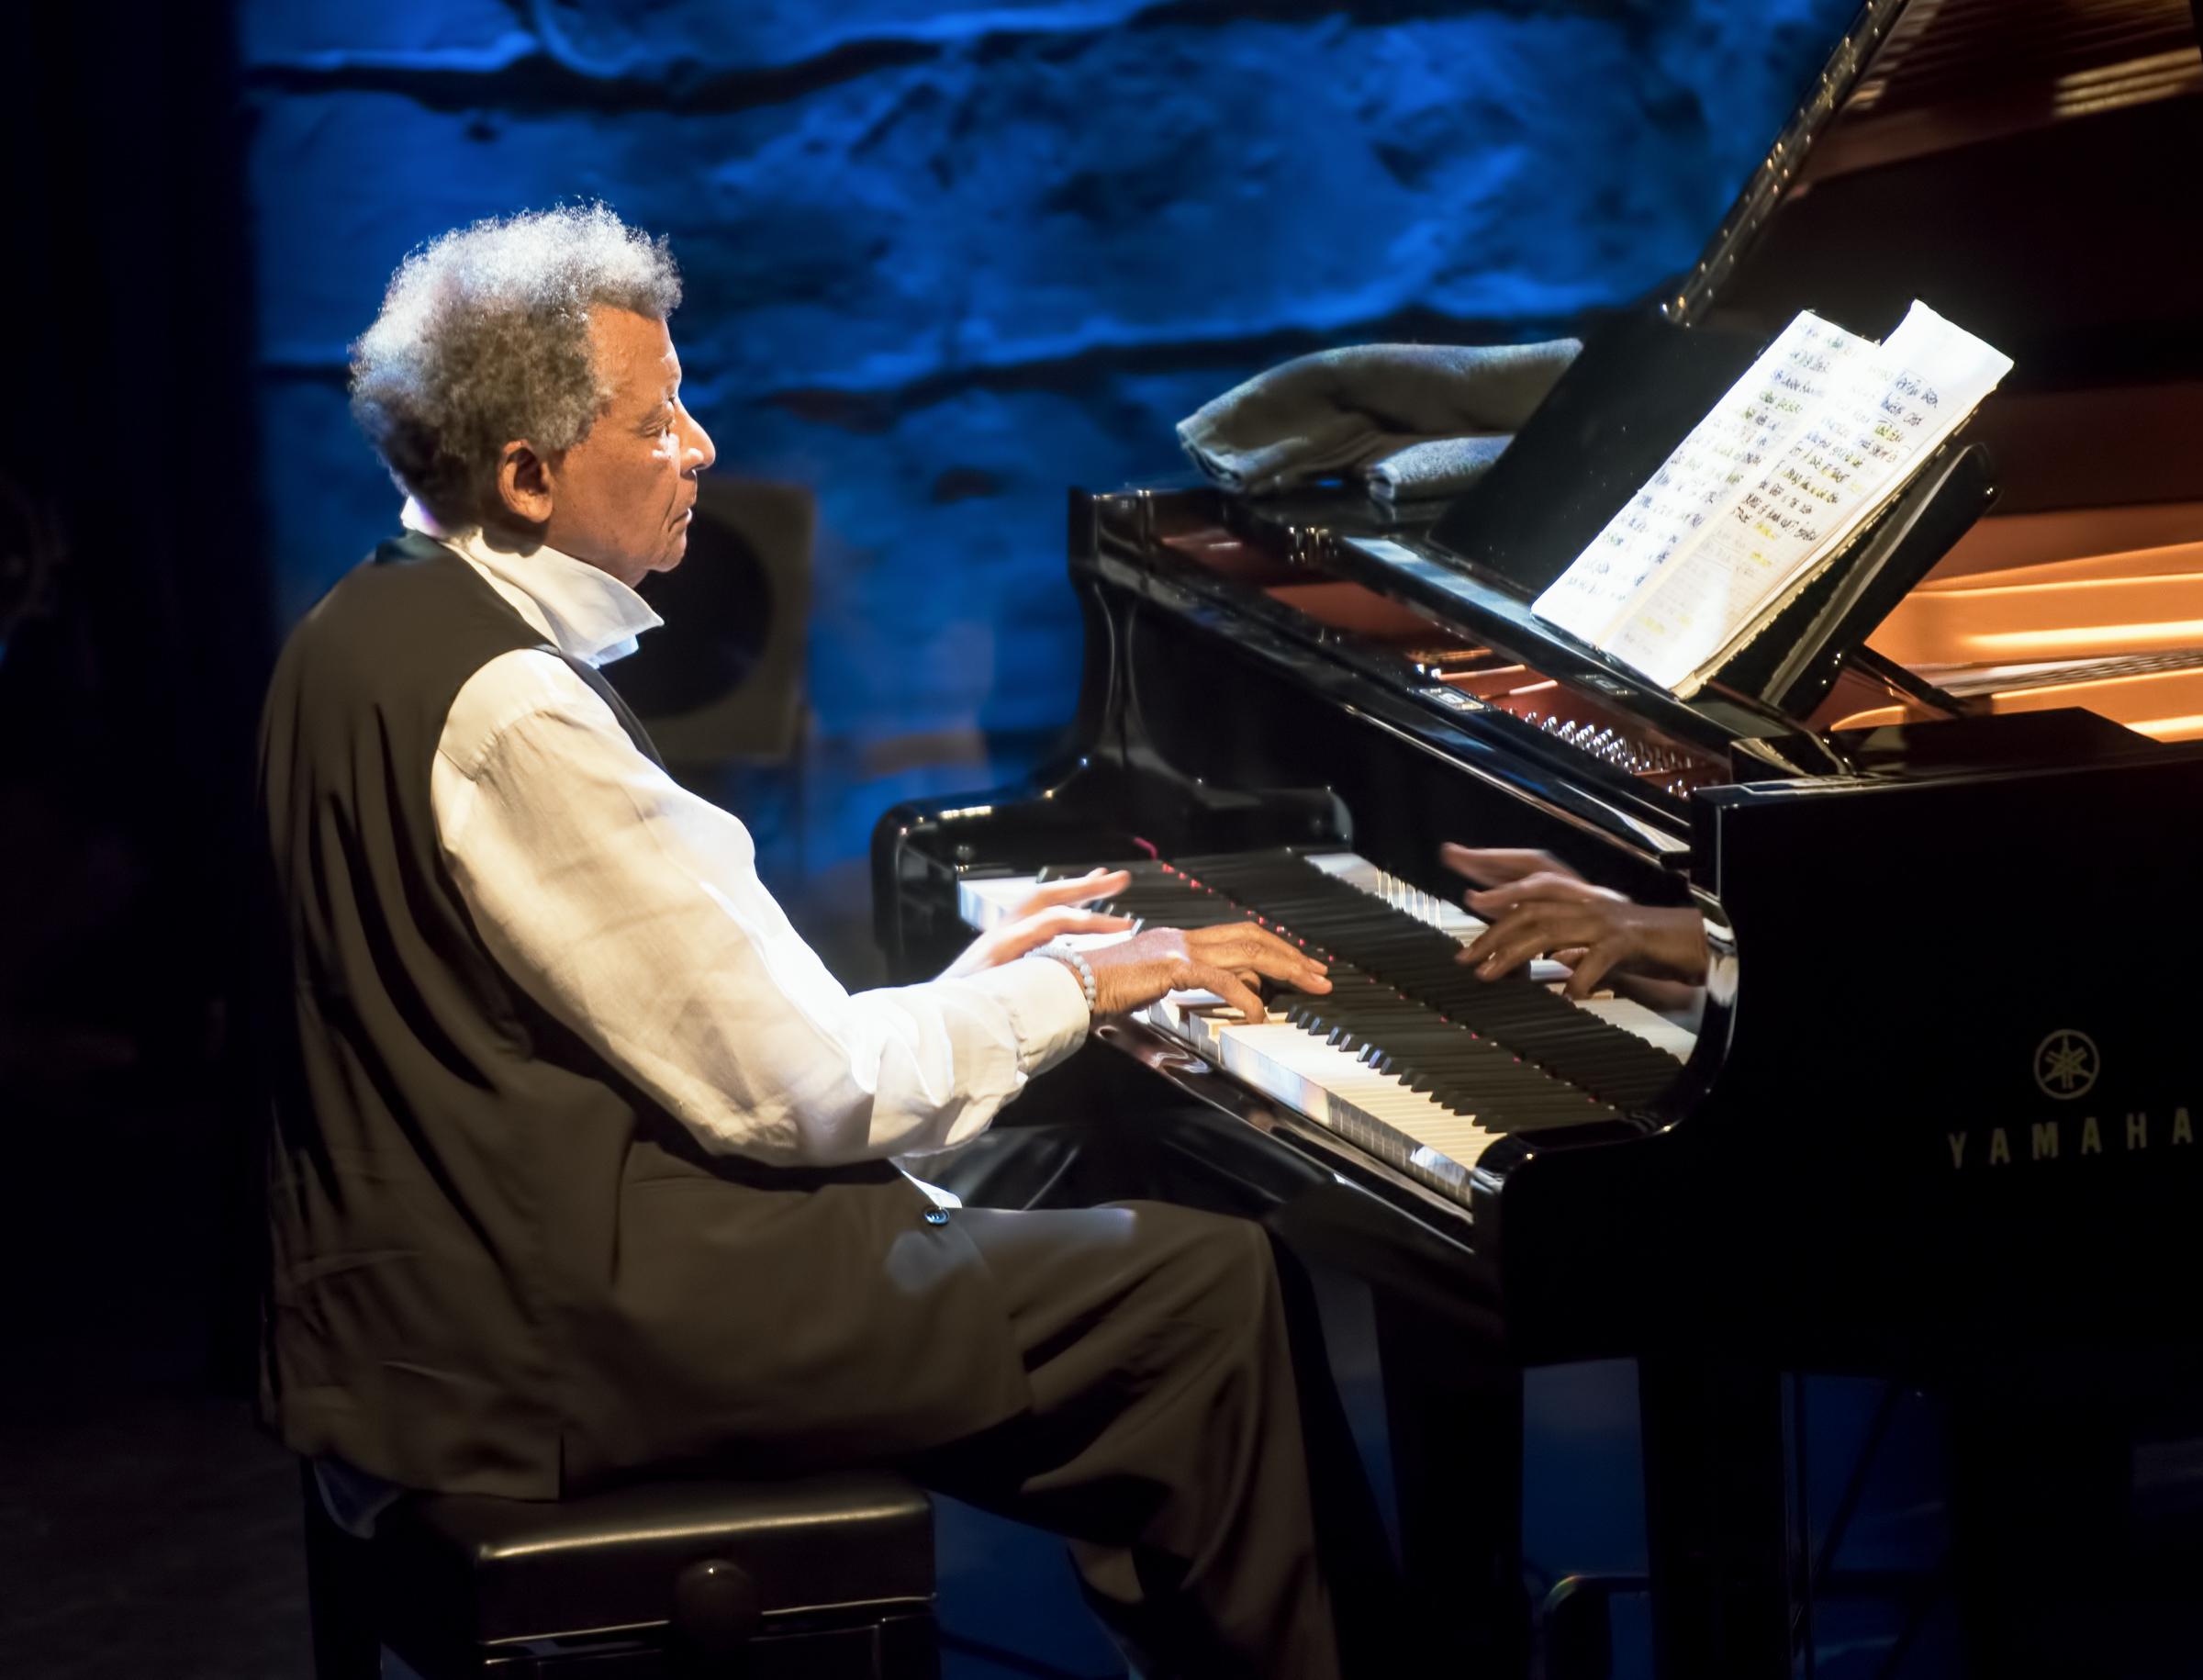 Abdullah Ibrahim at the Montreal Jazz Festival 2015